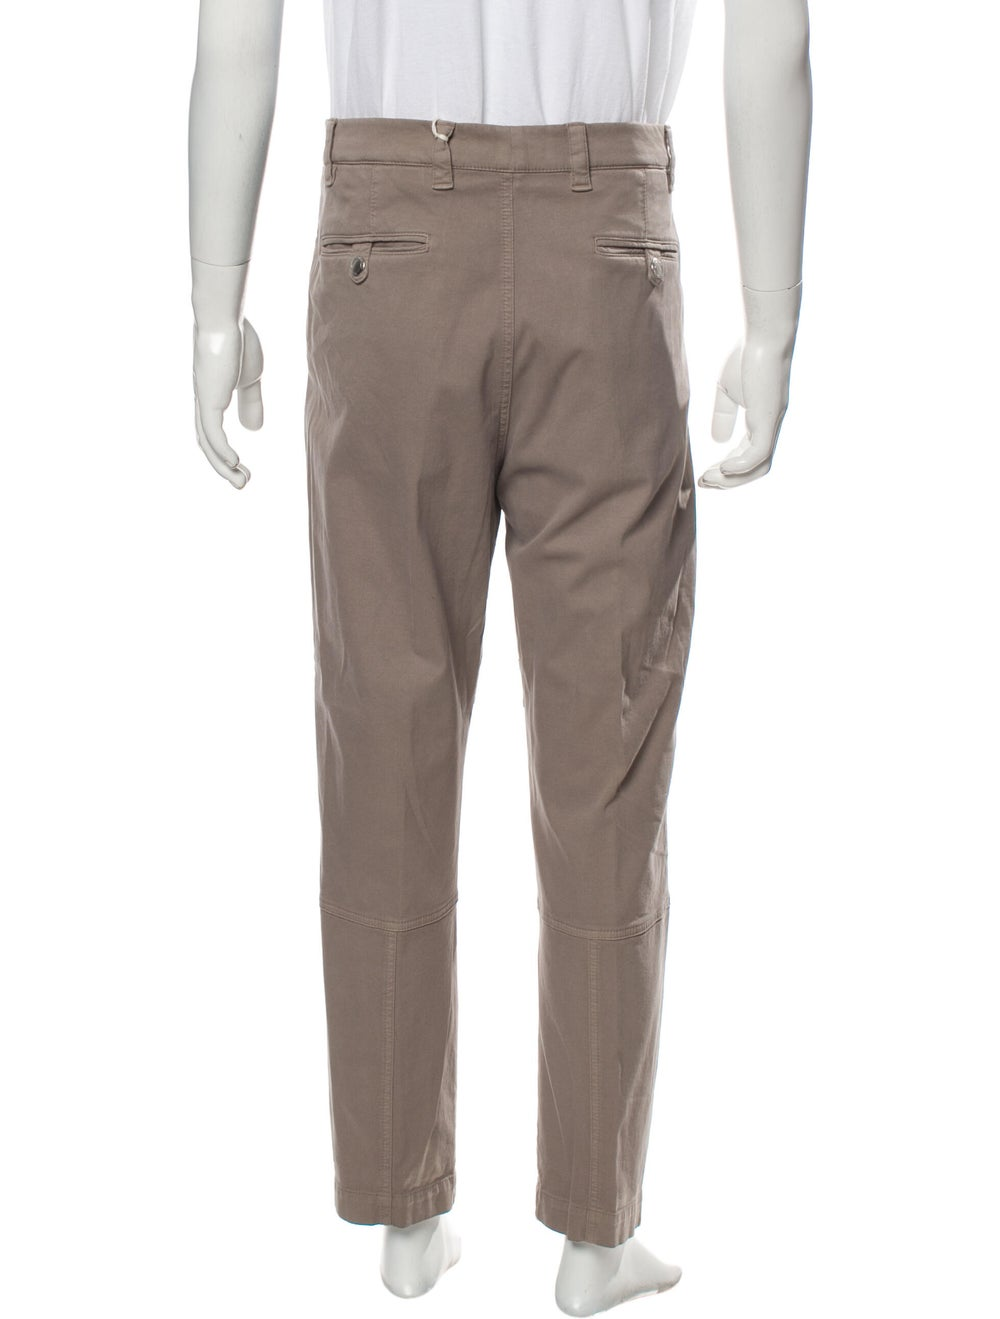 Brunello Cucinelli Cargo Pants - image 3